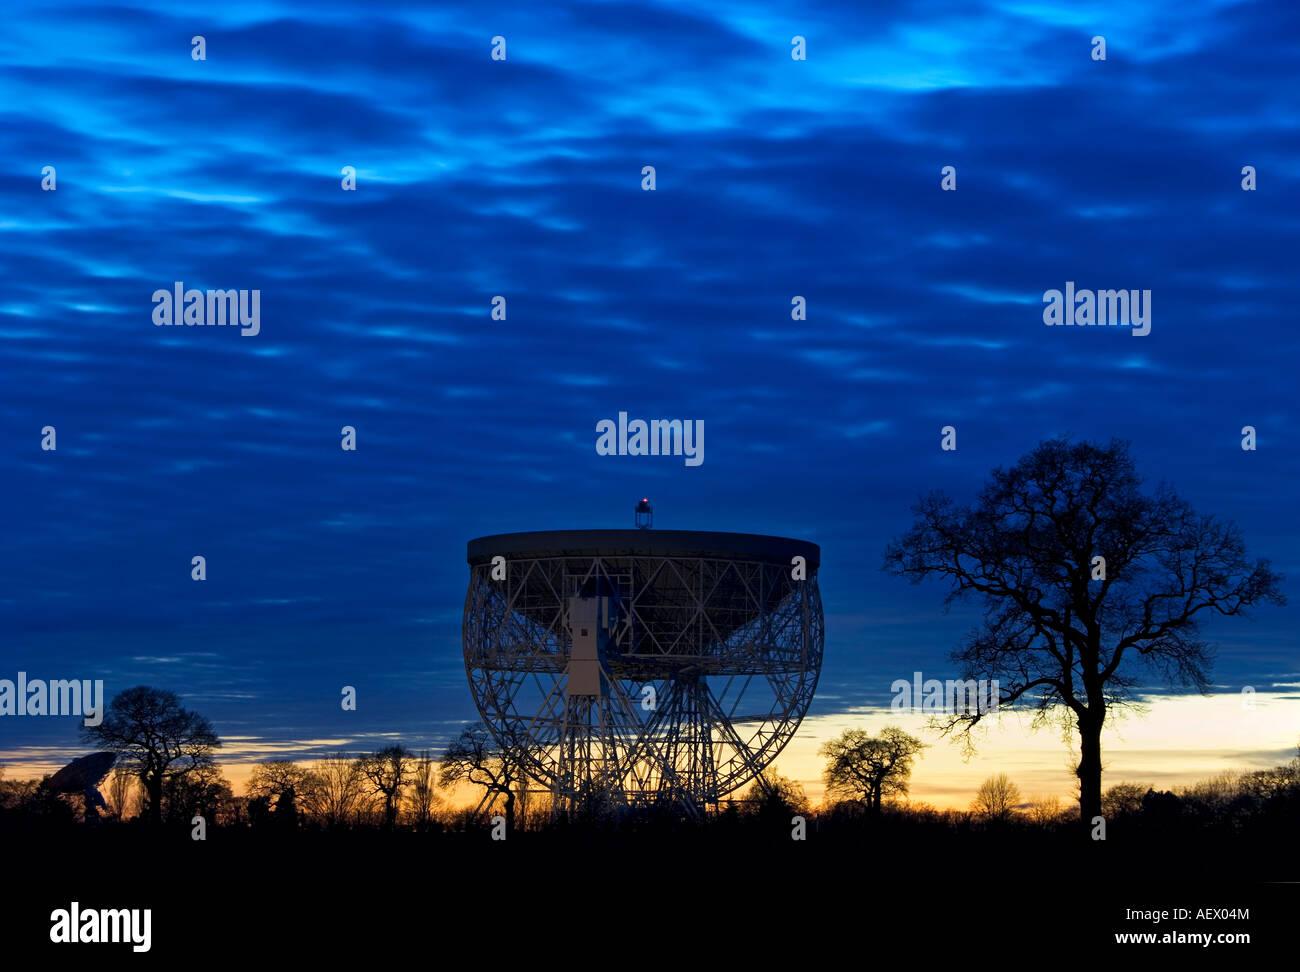 The Giant Mk 1A Radio Telescope of Jodrell Bank at Night, Near Holmes Chapel, Cheshire, England, UK - Stock Image